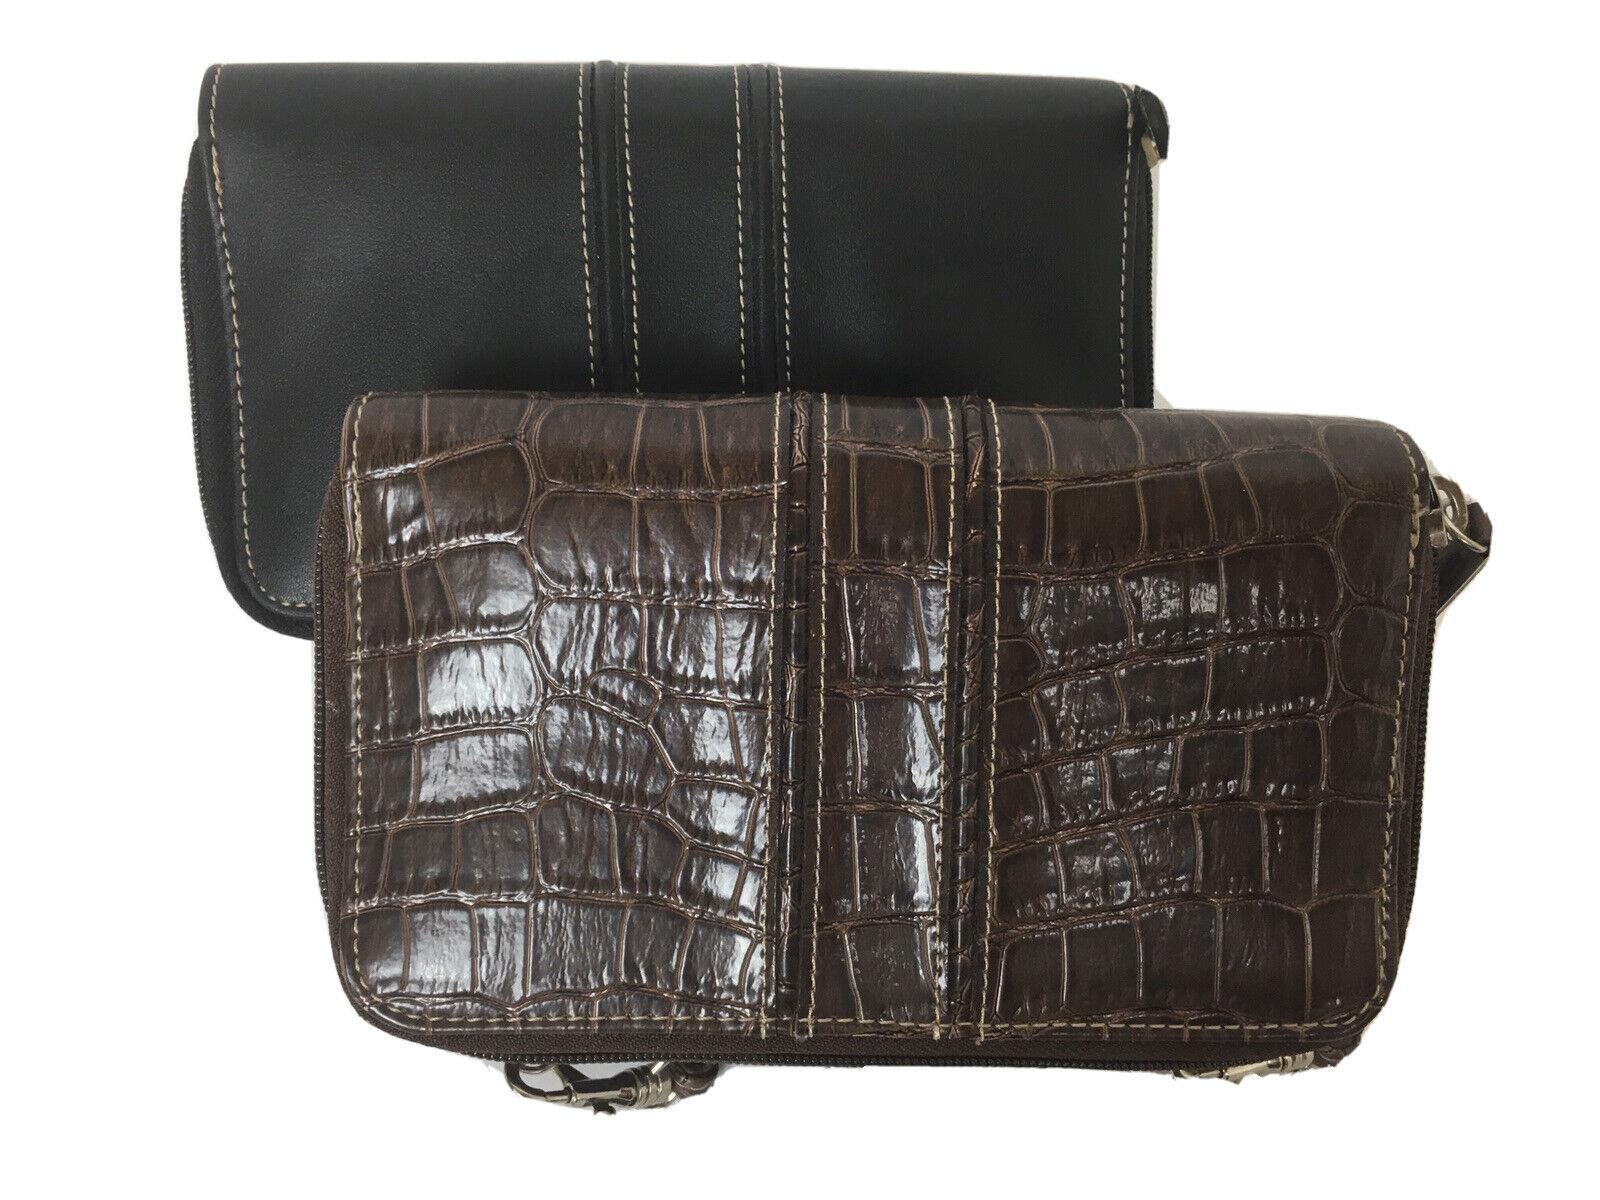 (2) WOMEN'S LIZ CLAIBORNE WALLET CROSSBODY WITH CREDIT CARD & PHONE HOLDER BAG